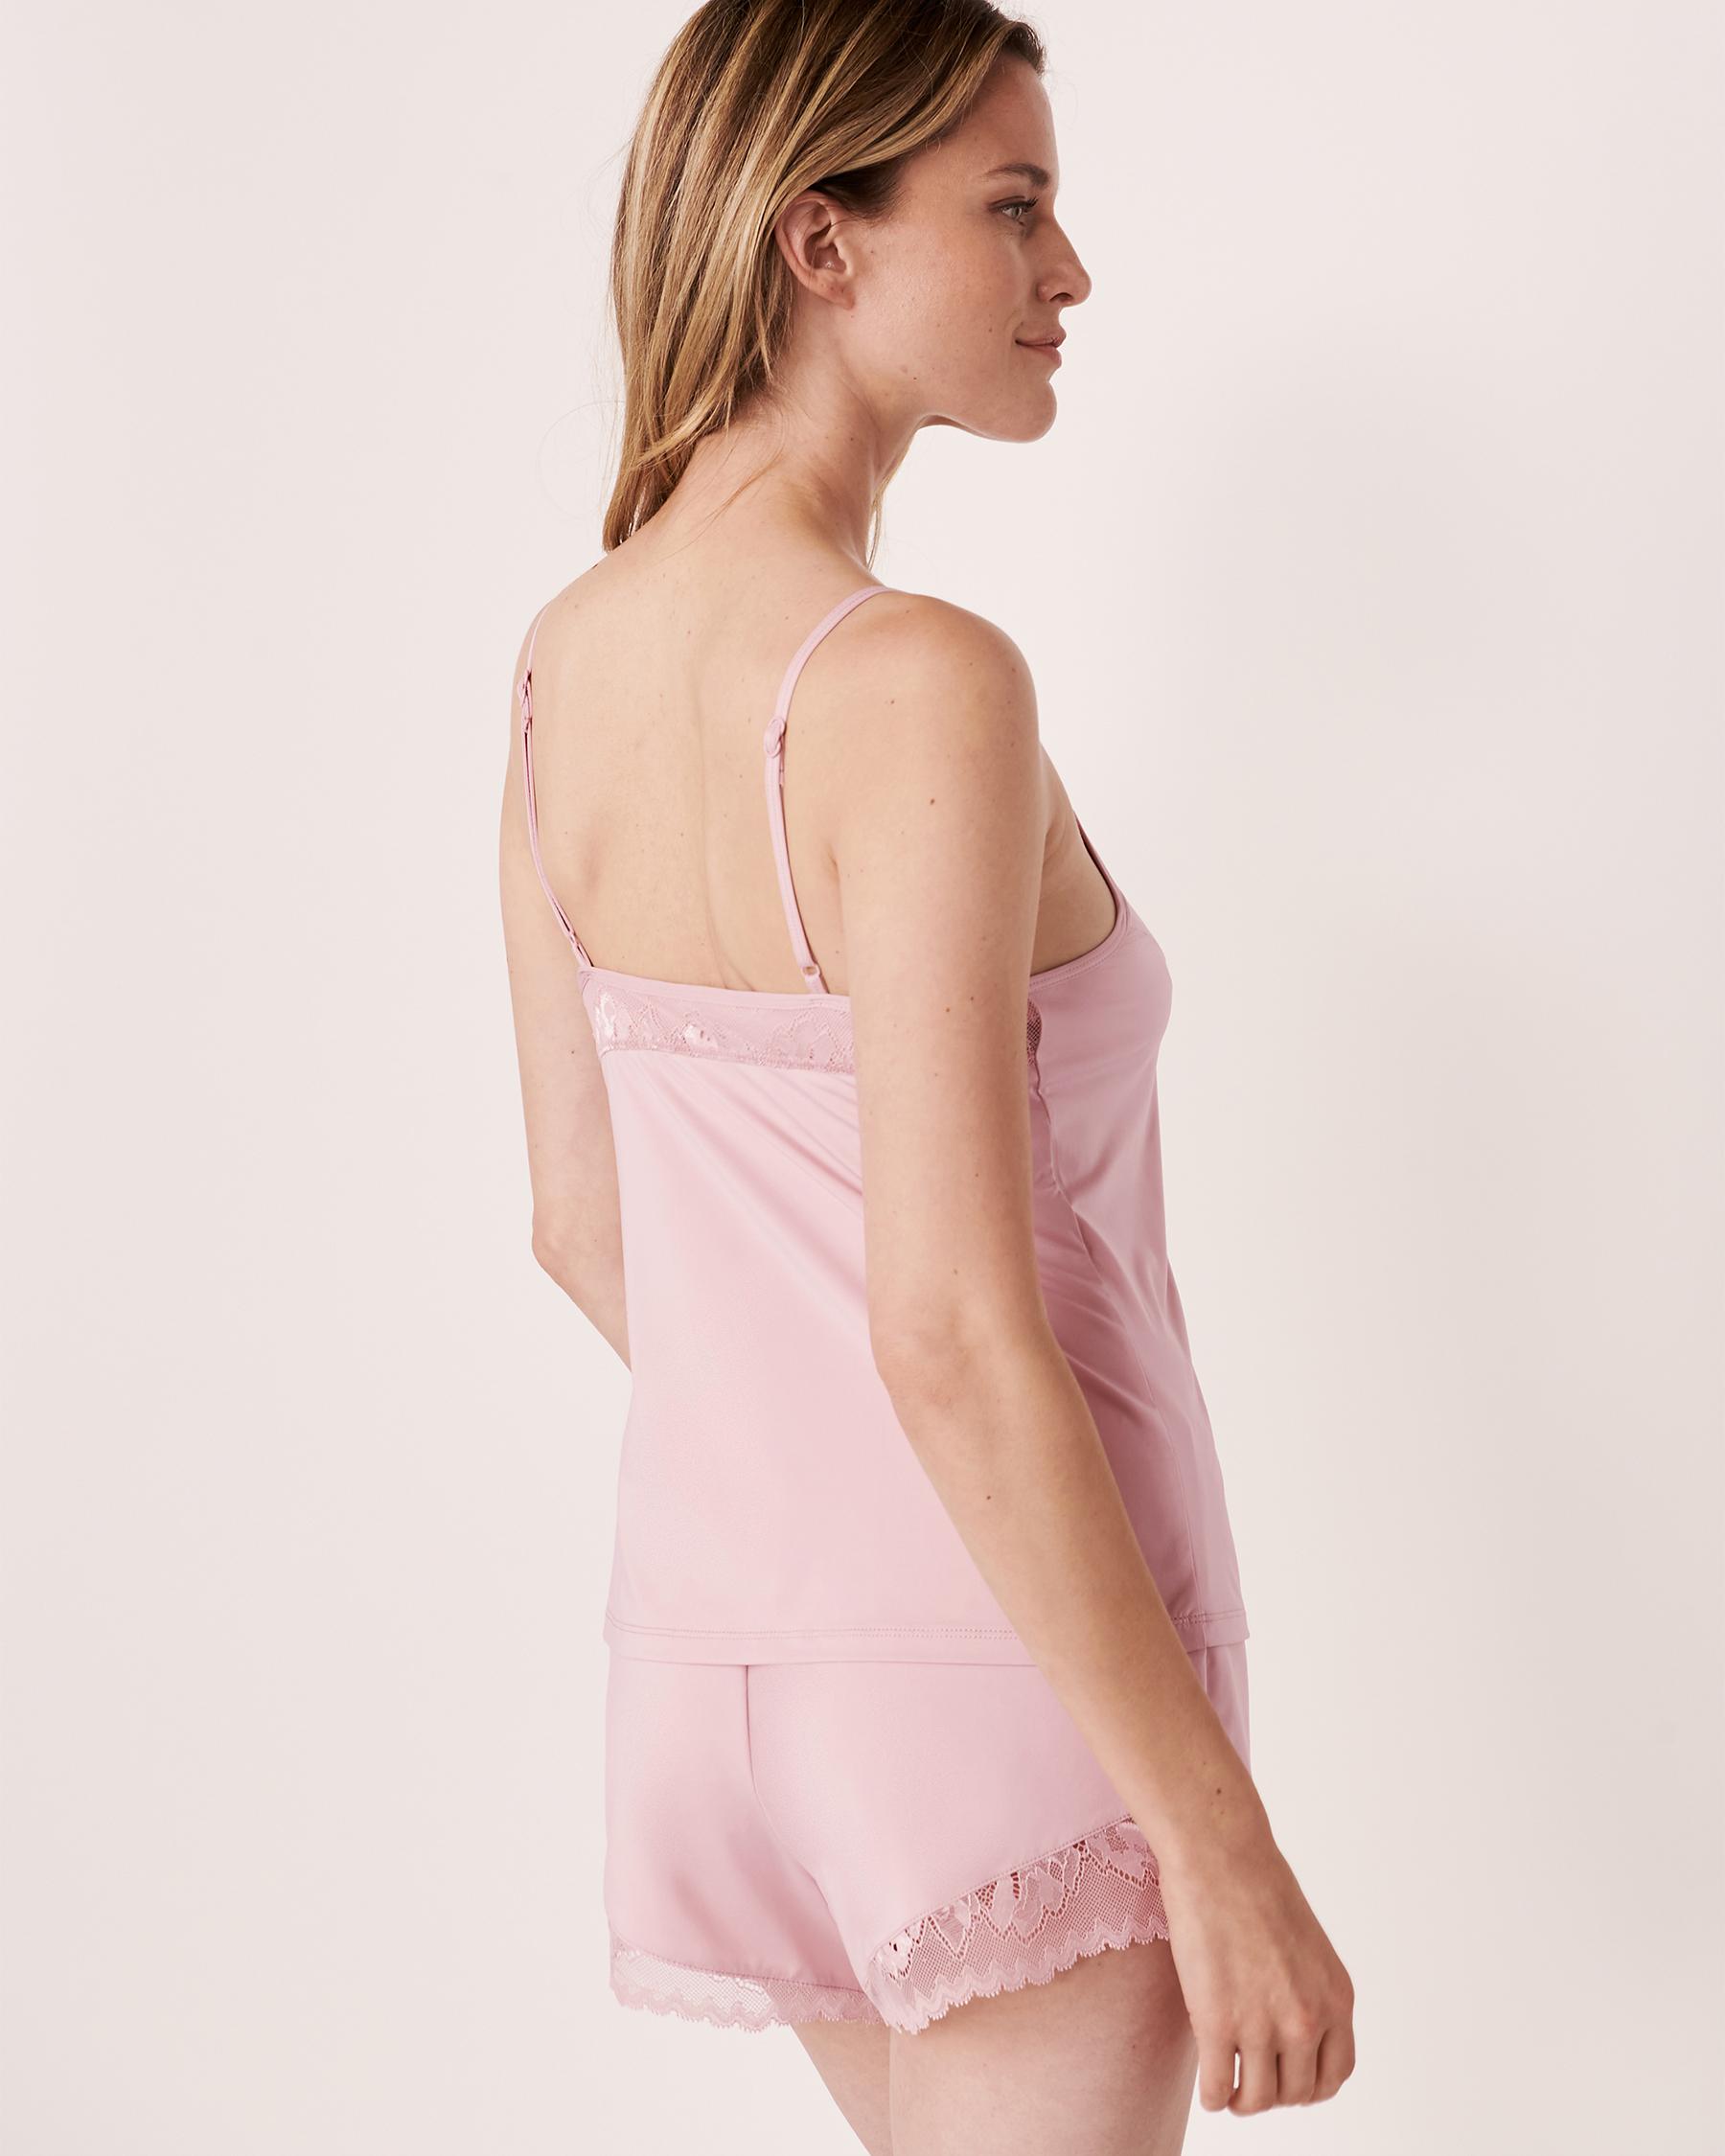 LA VIE EN ROSE Recycled Fibers Lace Trim Cami Lilac 60100005 - View2